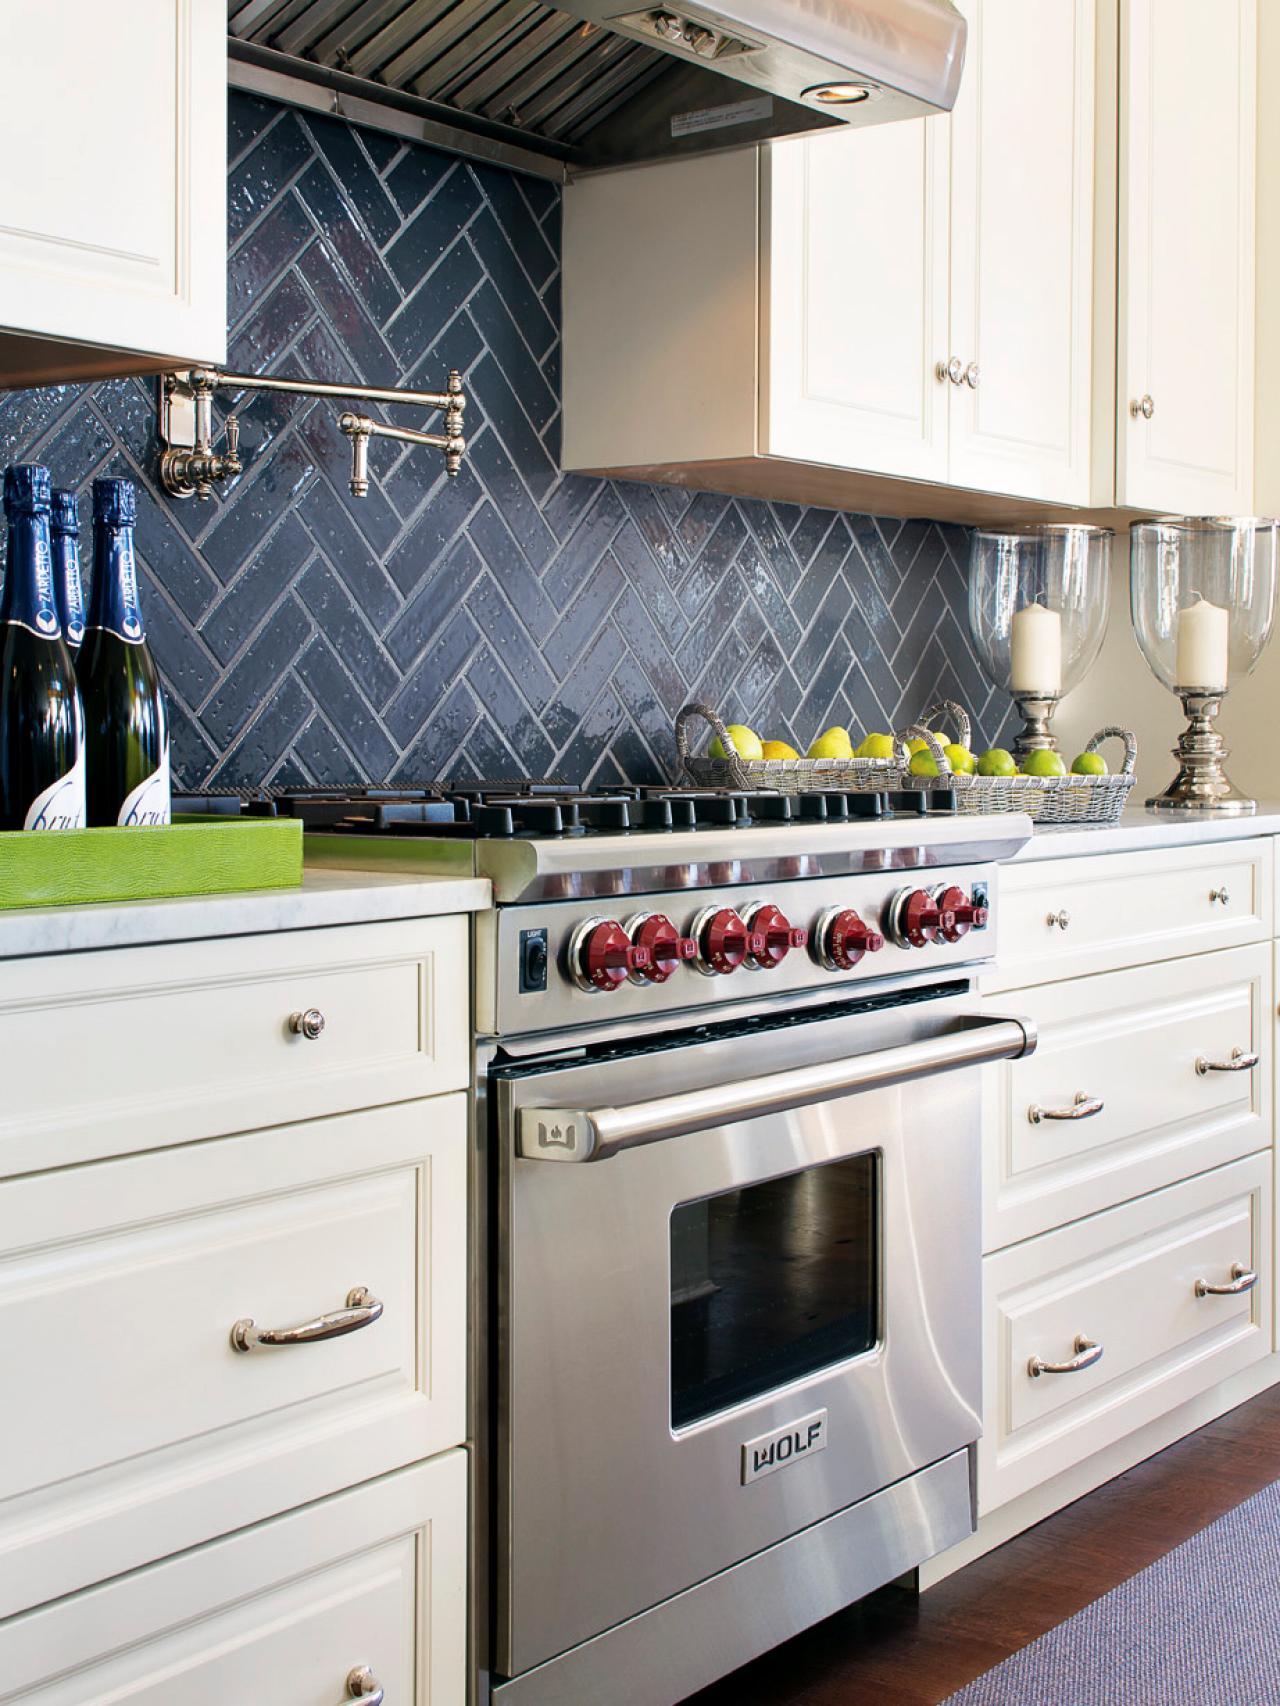 Mosaic Tile Backsplash Ideas: Pictures & Tips From HGTV ... on Black Countertop Backsplash Ideas  id=87494